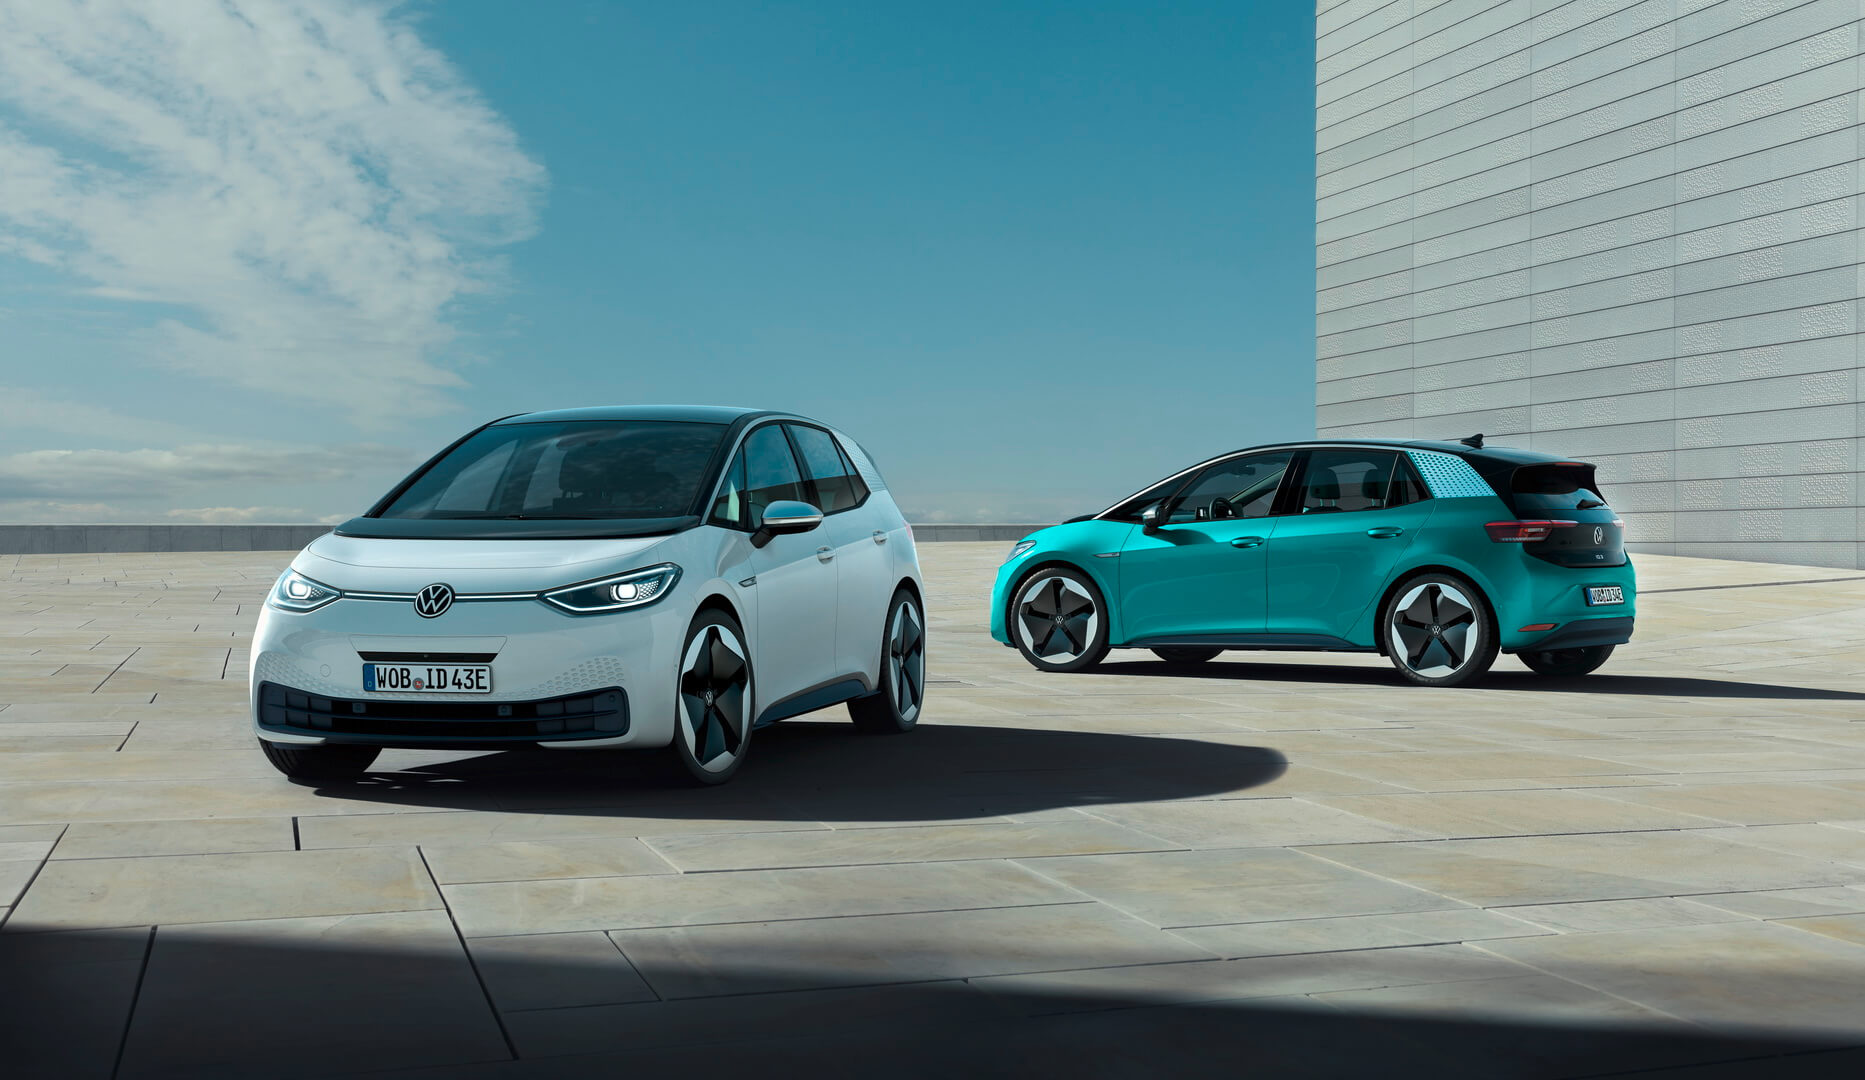 Фотография экоавто Volkswagen ID.3 1ST (Mid-Range) - фото 9